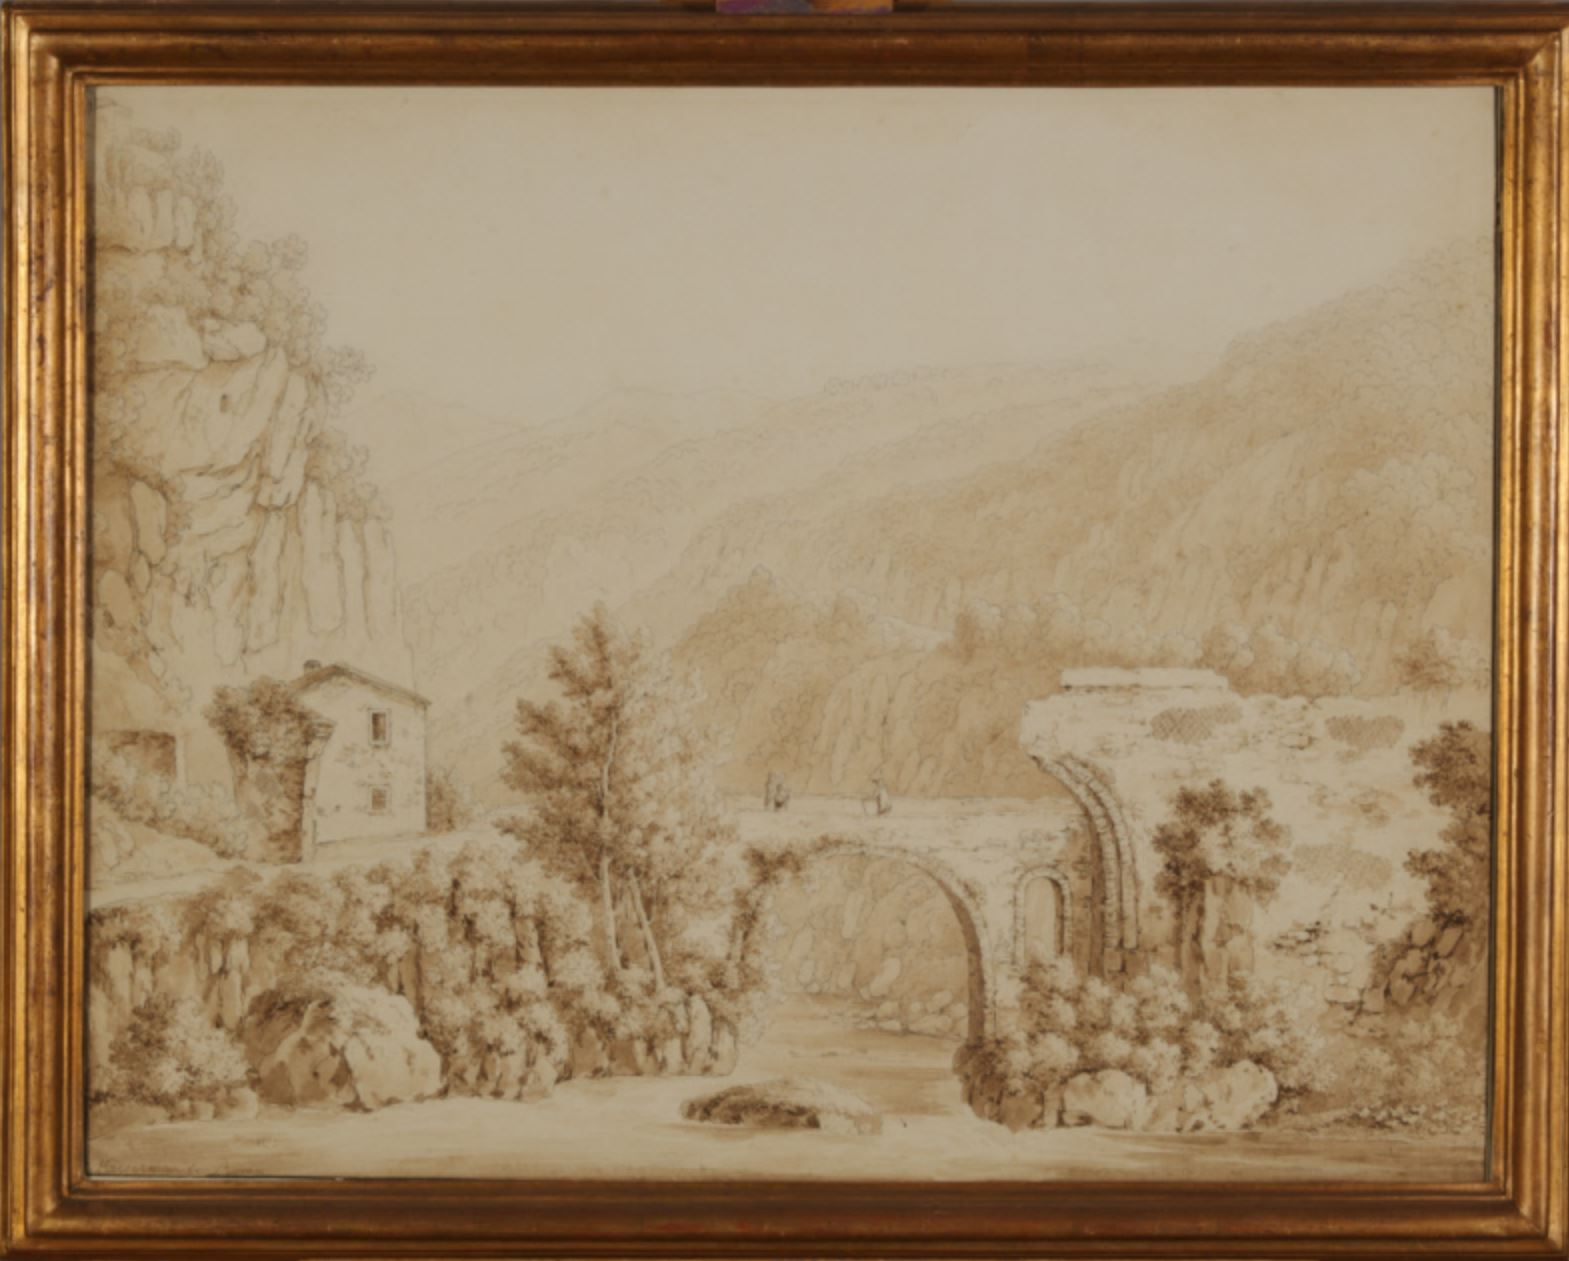 Francois Kaisermann The Bridge of Augustus near Narni Florence Court, County Fermanagh